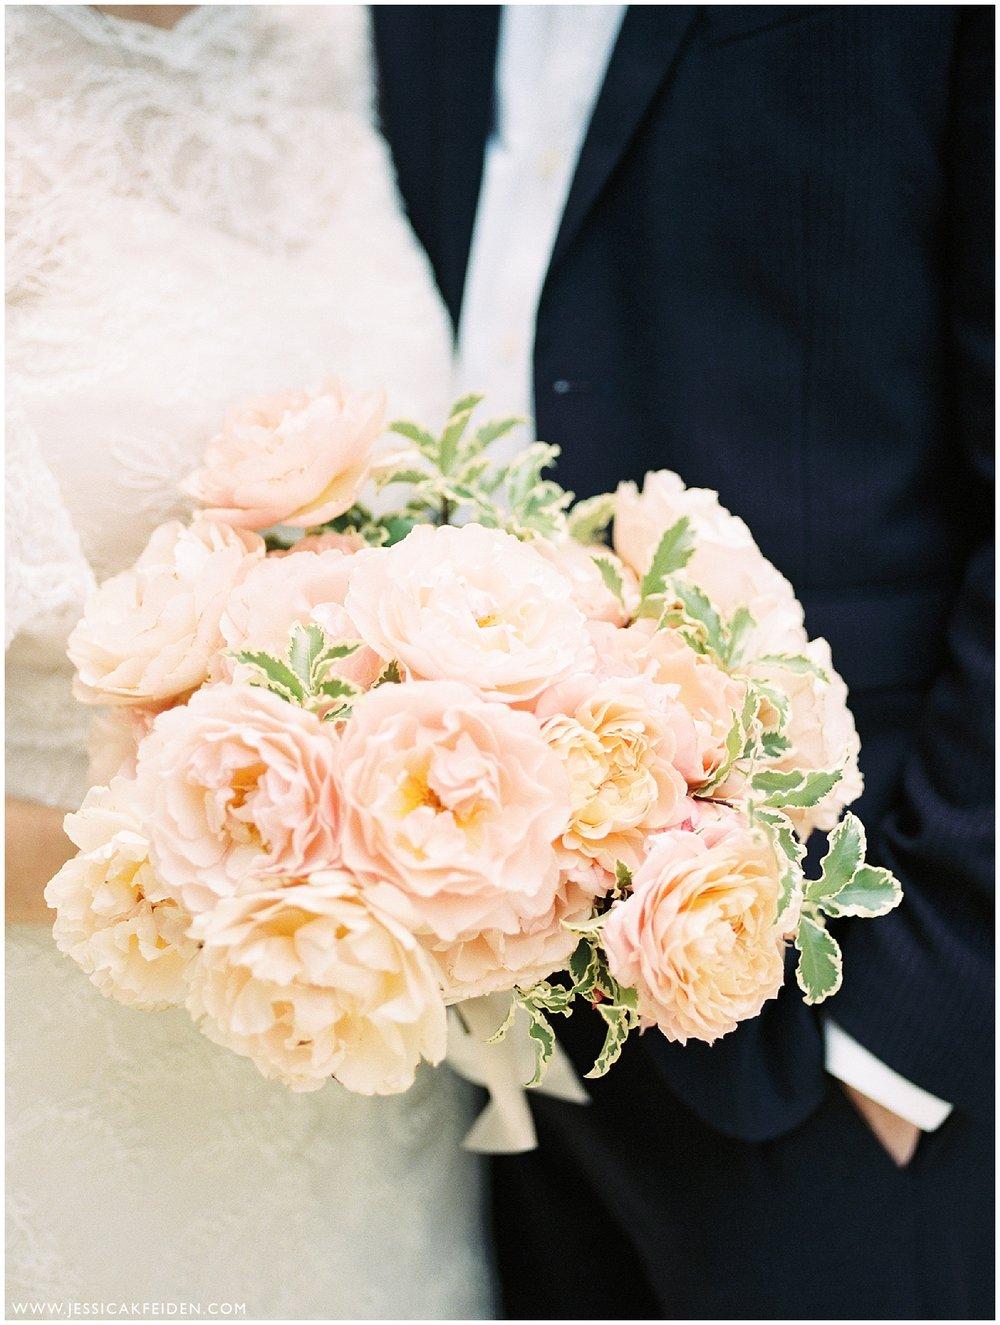 Jessica K Feiden Photography - Destination Paris Wedding_Film Photography_0005.jpg